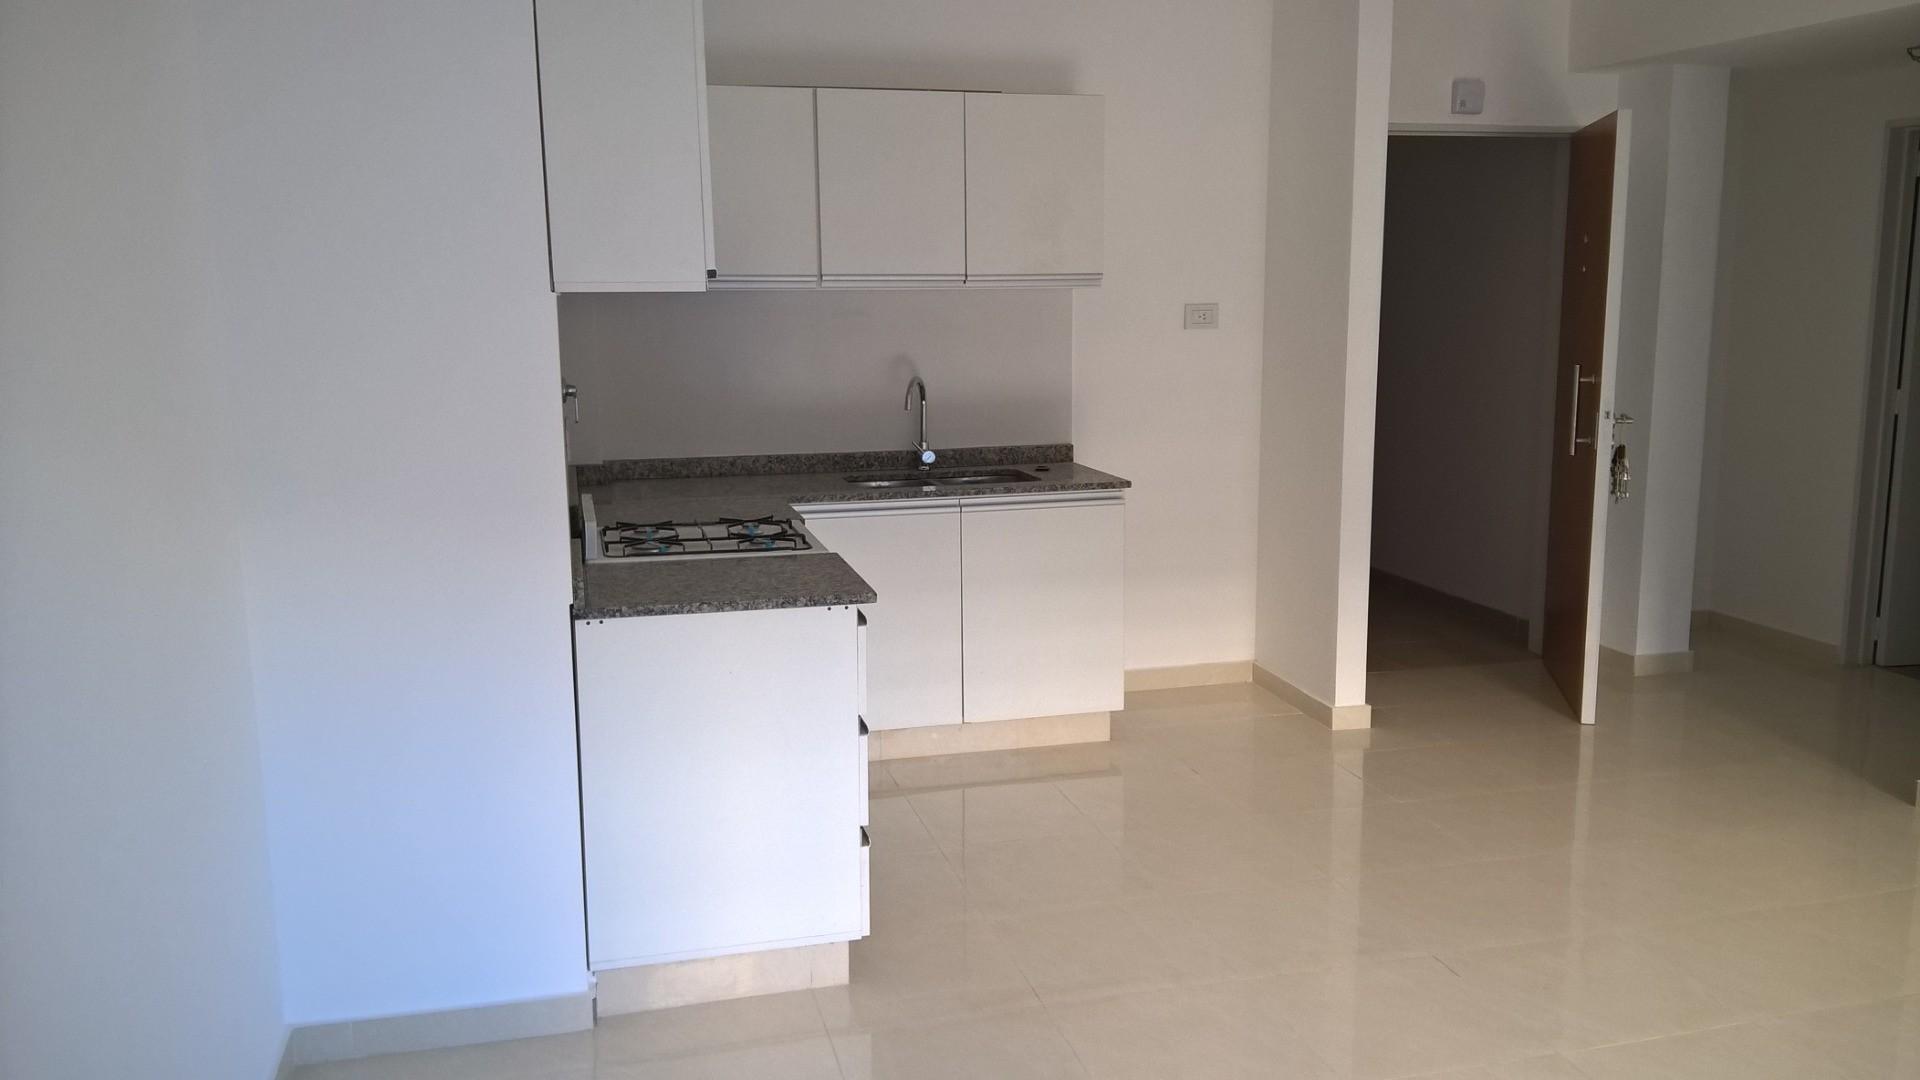 Departamento - 46 m² | 1 dormitorio | Apto profesional